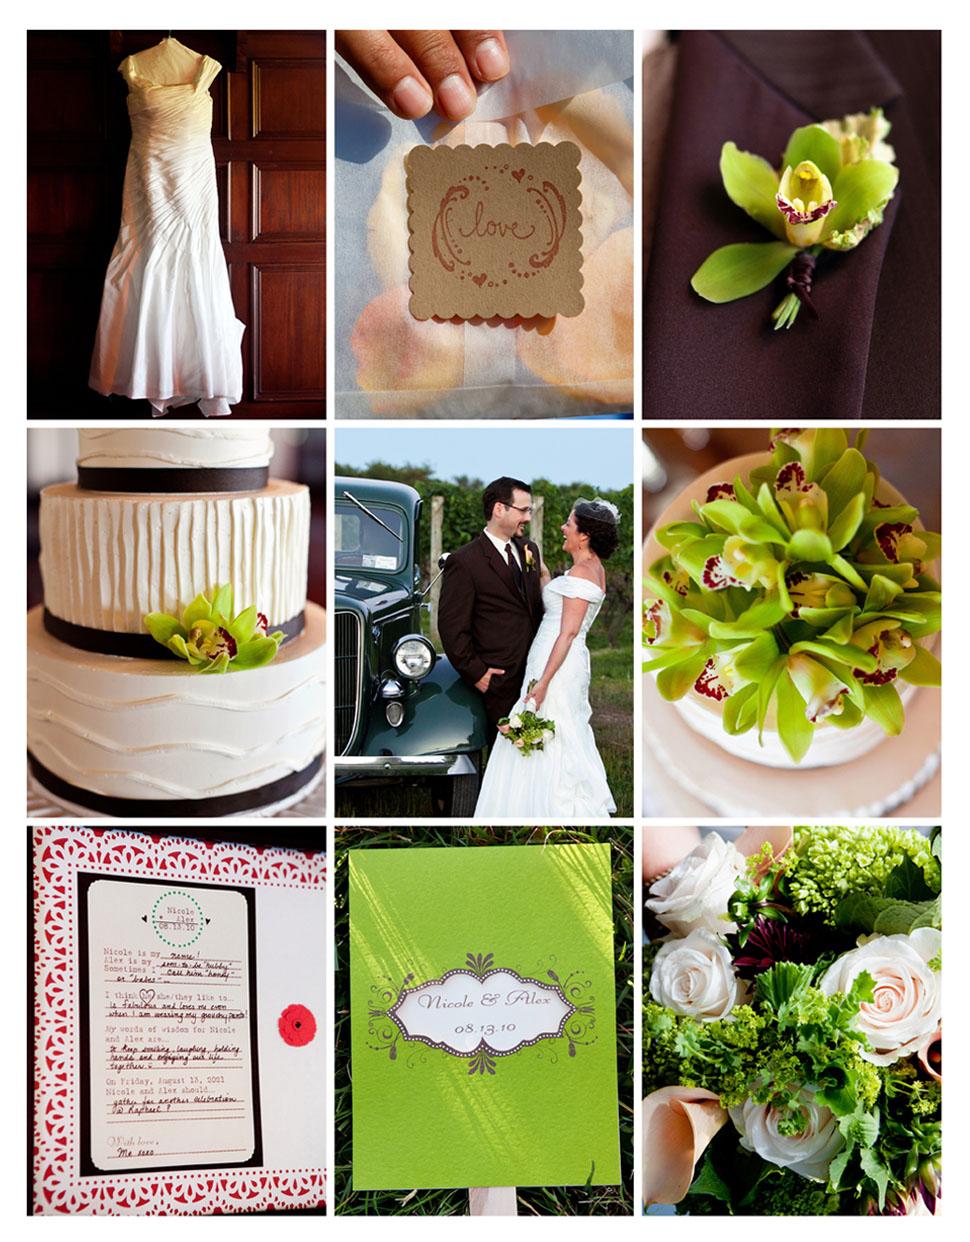 New York City Wedding Photographers Long Island Wedding Photographers Nicole & Alex  inspiration Blog Post.jpg